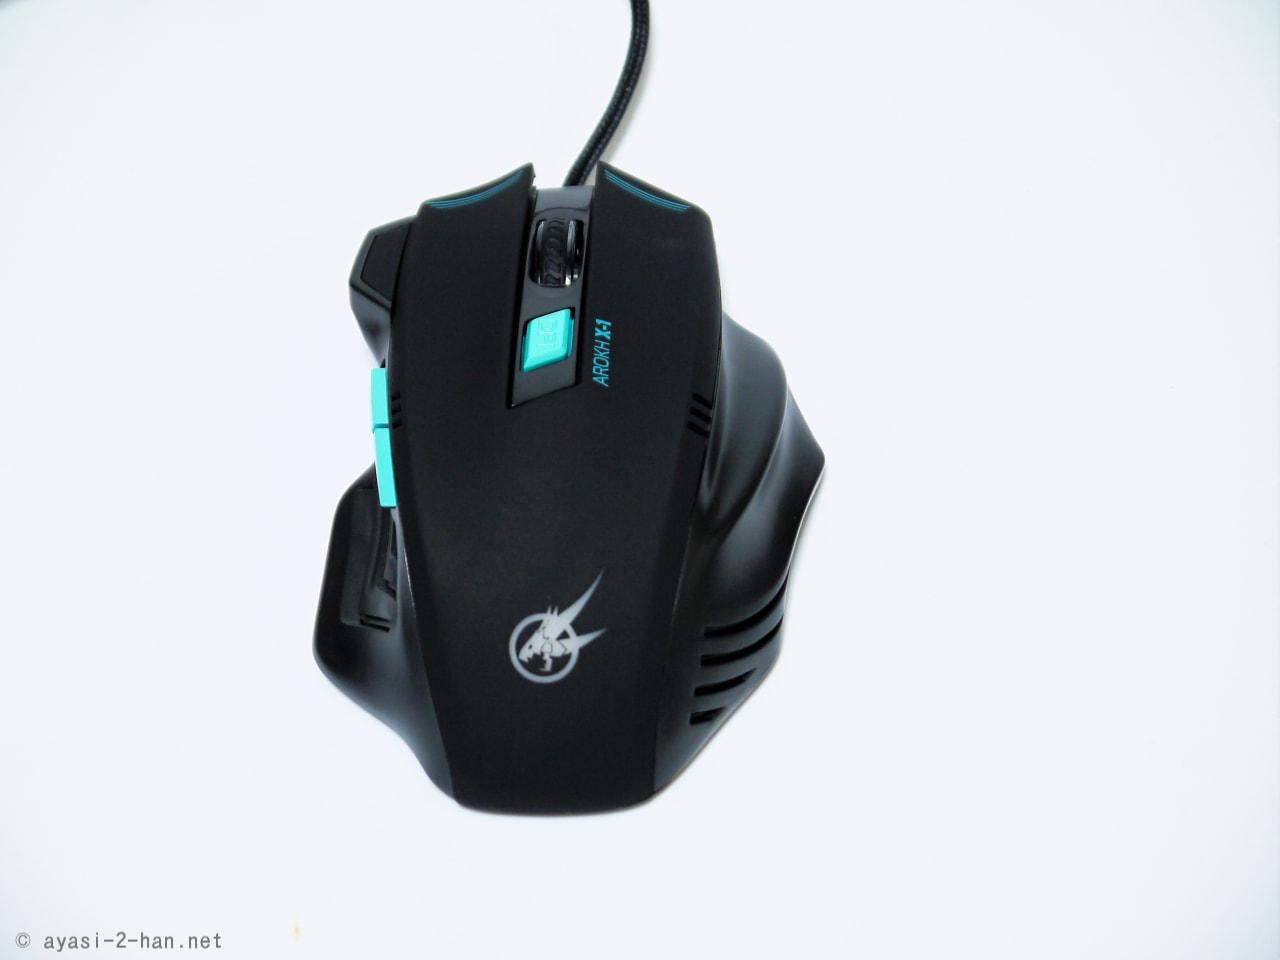 [PR]かぶせ持ちでのグリップ感がスゴい! ゲーミングマウス「AROKH X-1」の感想とか。